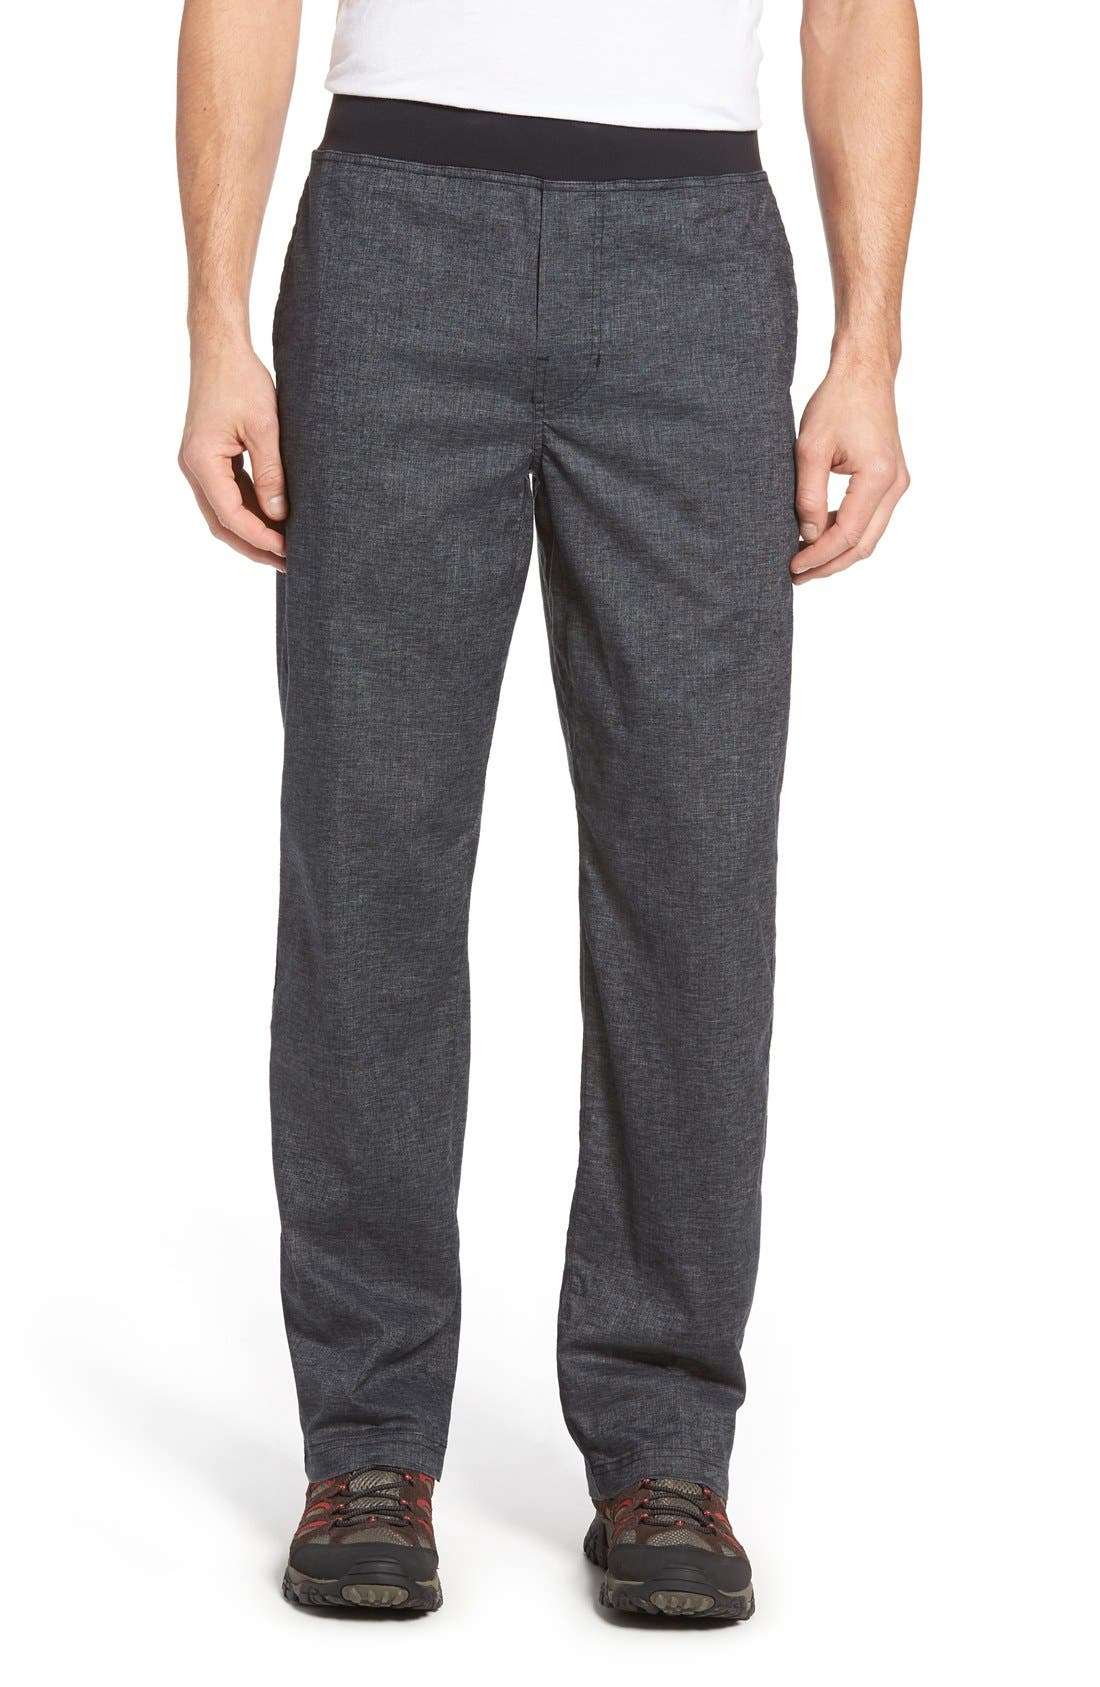 Vaha Pants,                         Main,                         color, 001